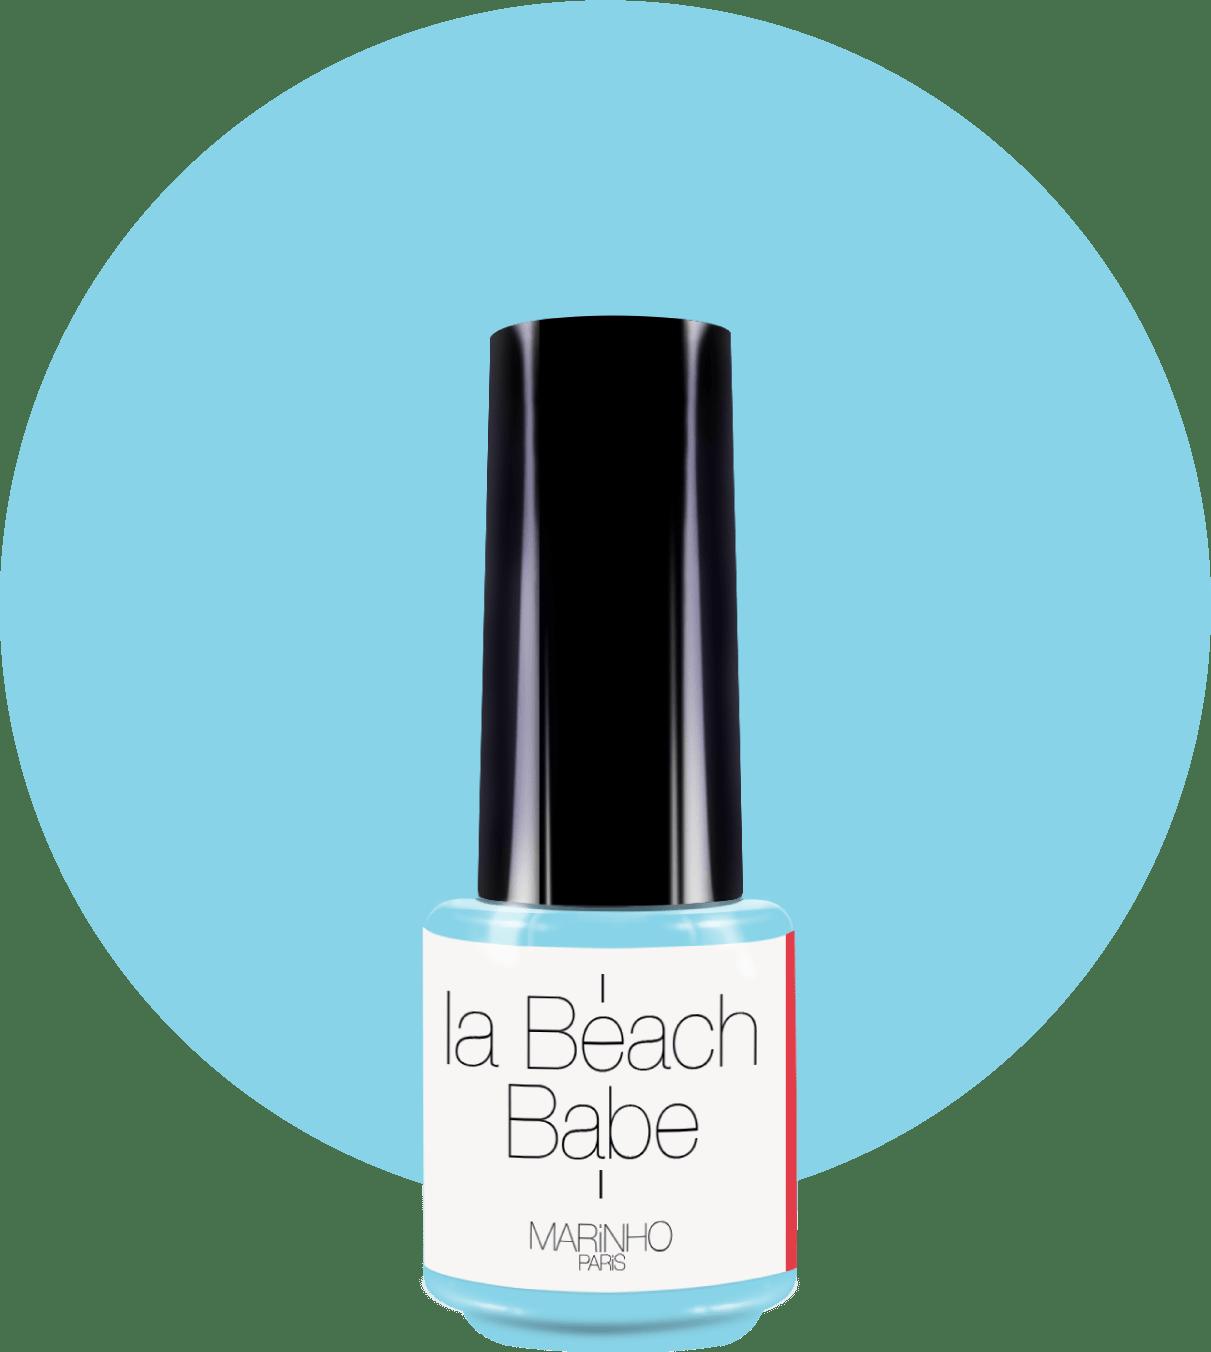 vernis semi-permanent bleu clair marinho paris sur rond bleu clair